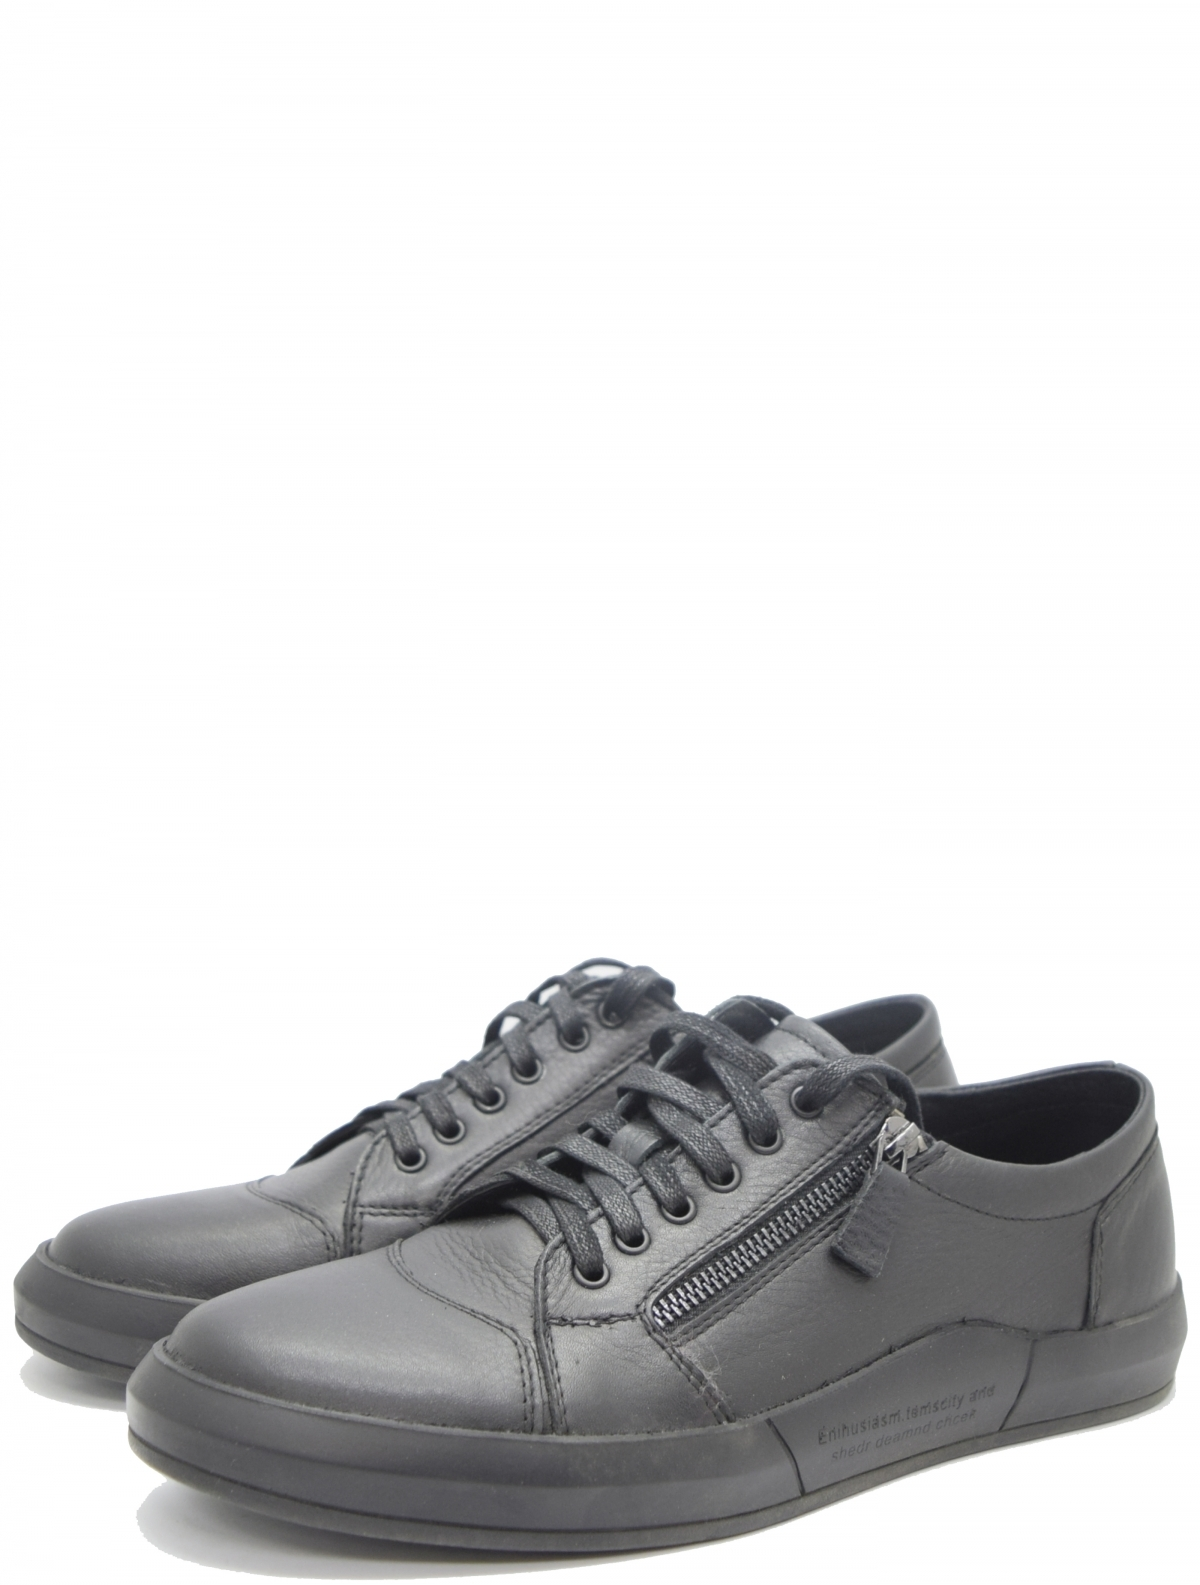 Rooman 500-234-M1C мужские туфли